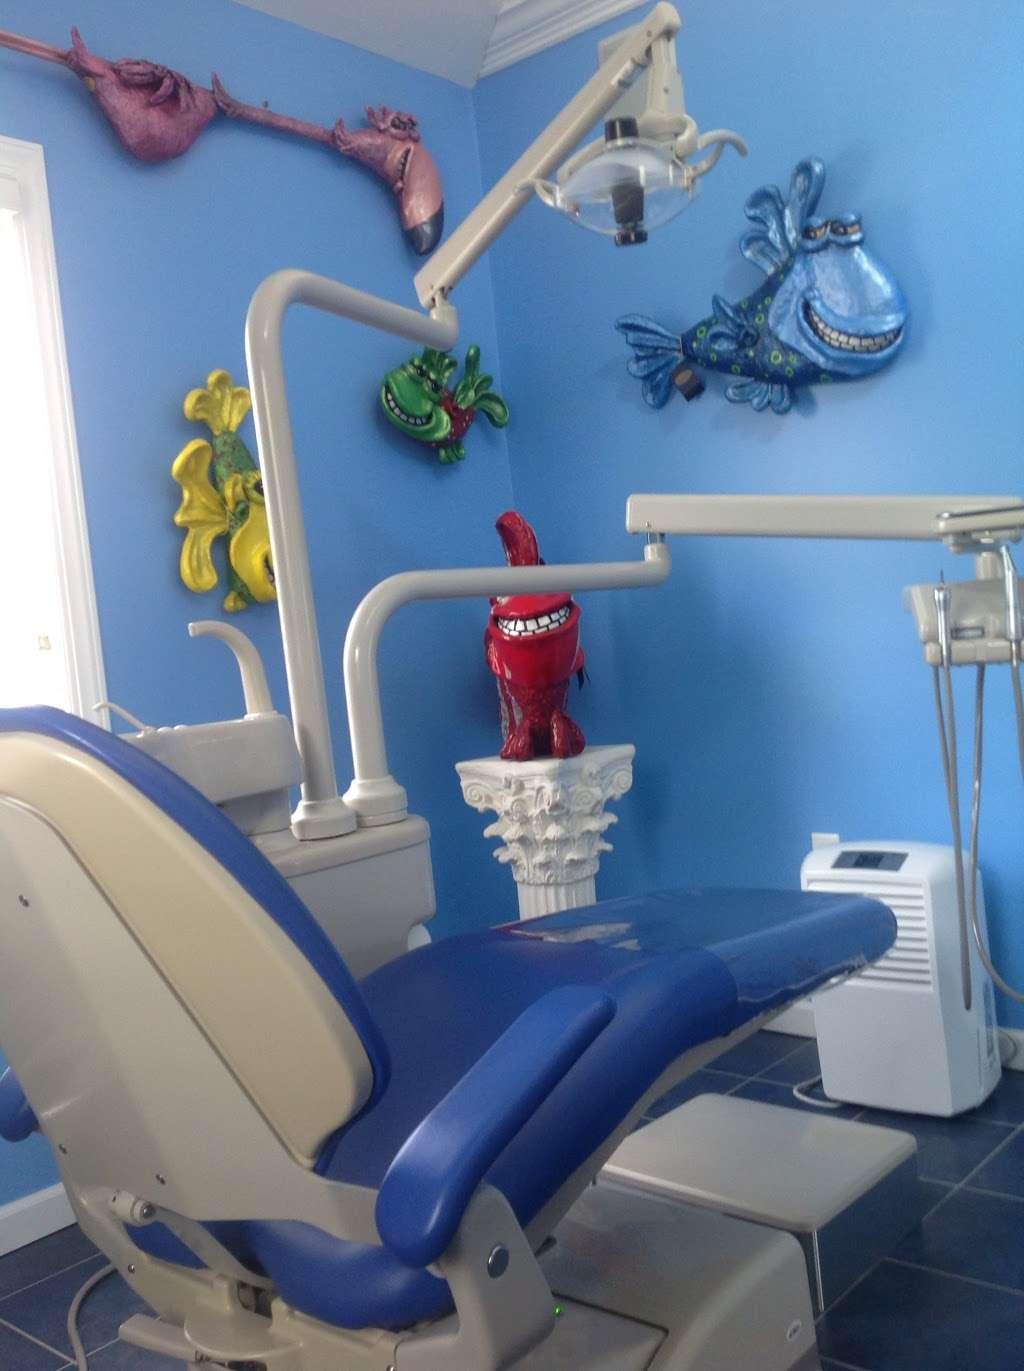 A Plus Family Dentistry: Jersey City - dentist  | Photo 3 of 10 | Address: 273a Monmouth St, Jersey City, NJ 07302, USA | Phone: (201) 435-7700